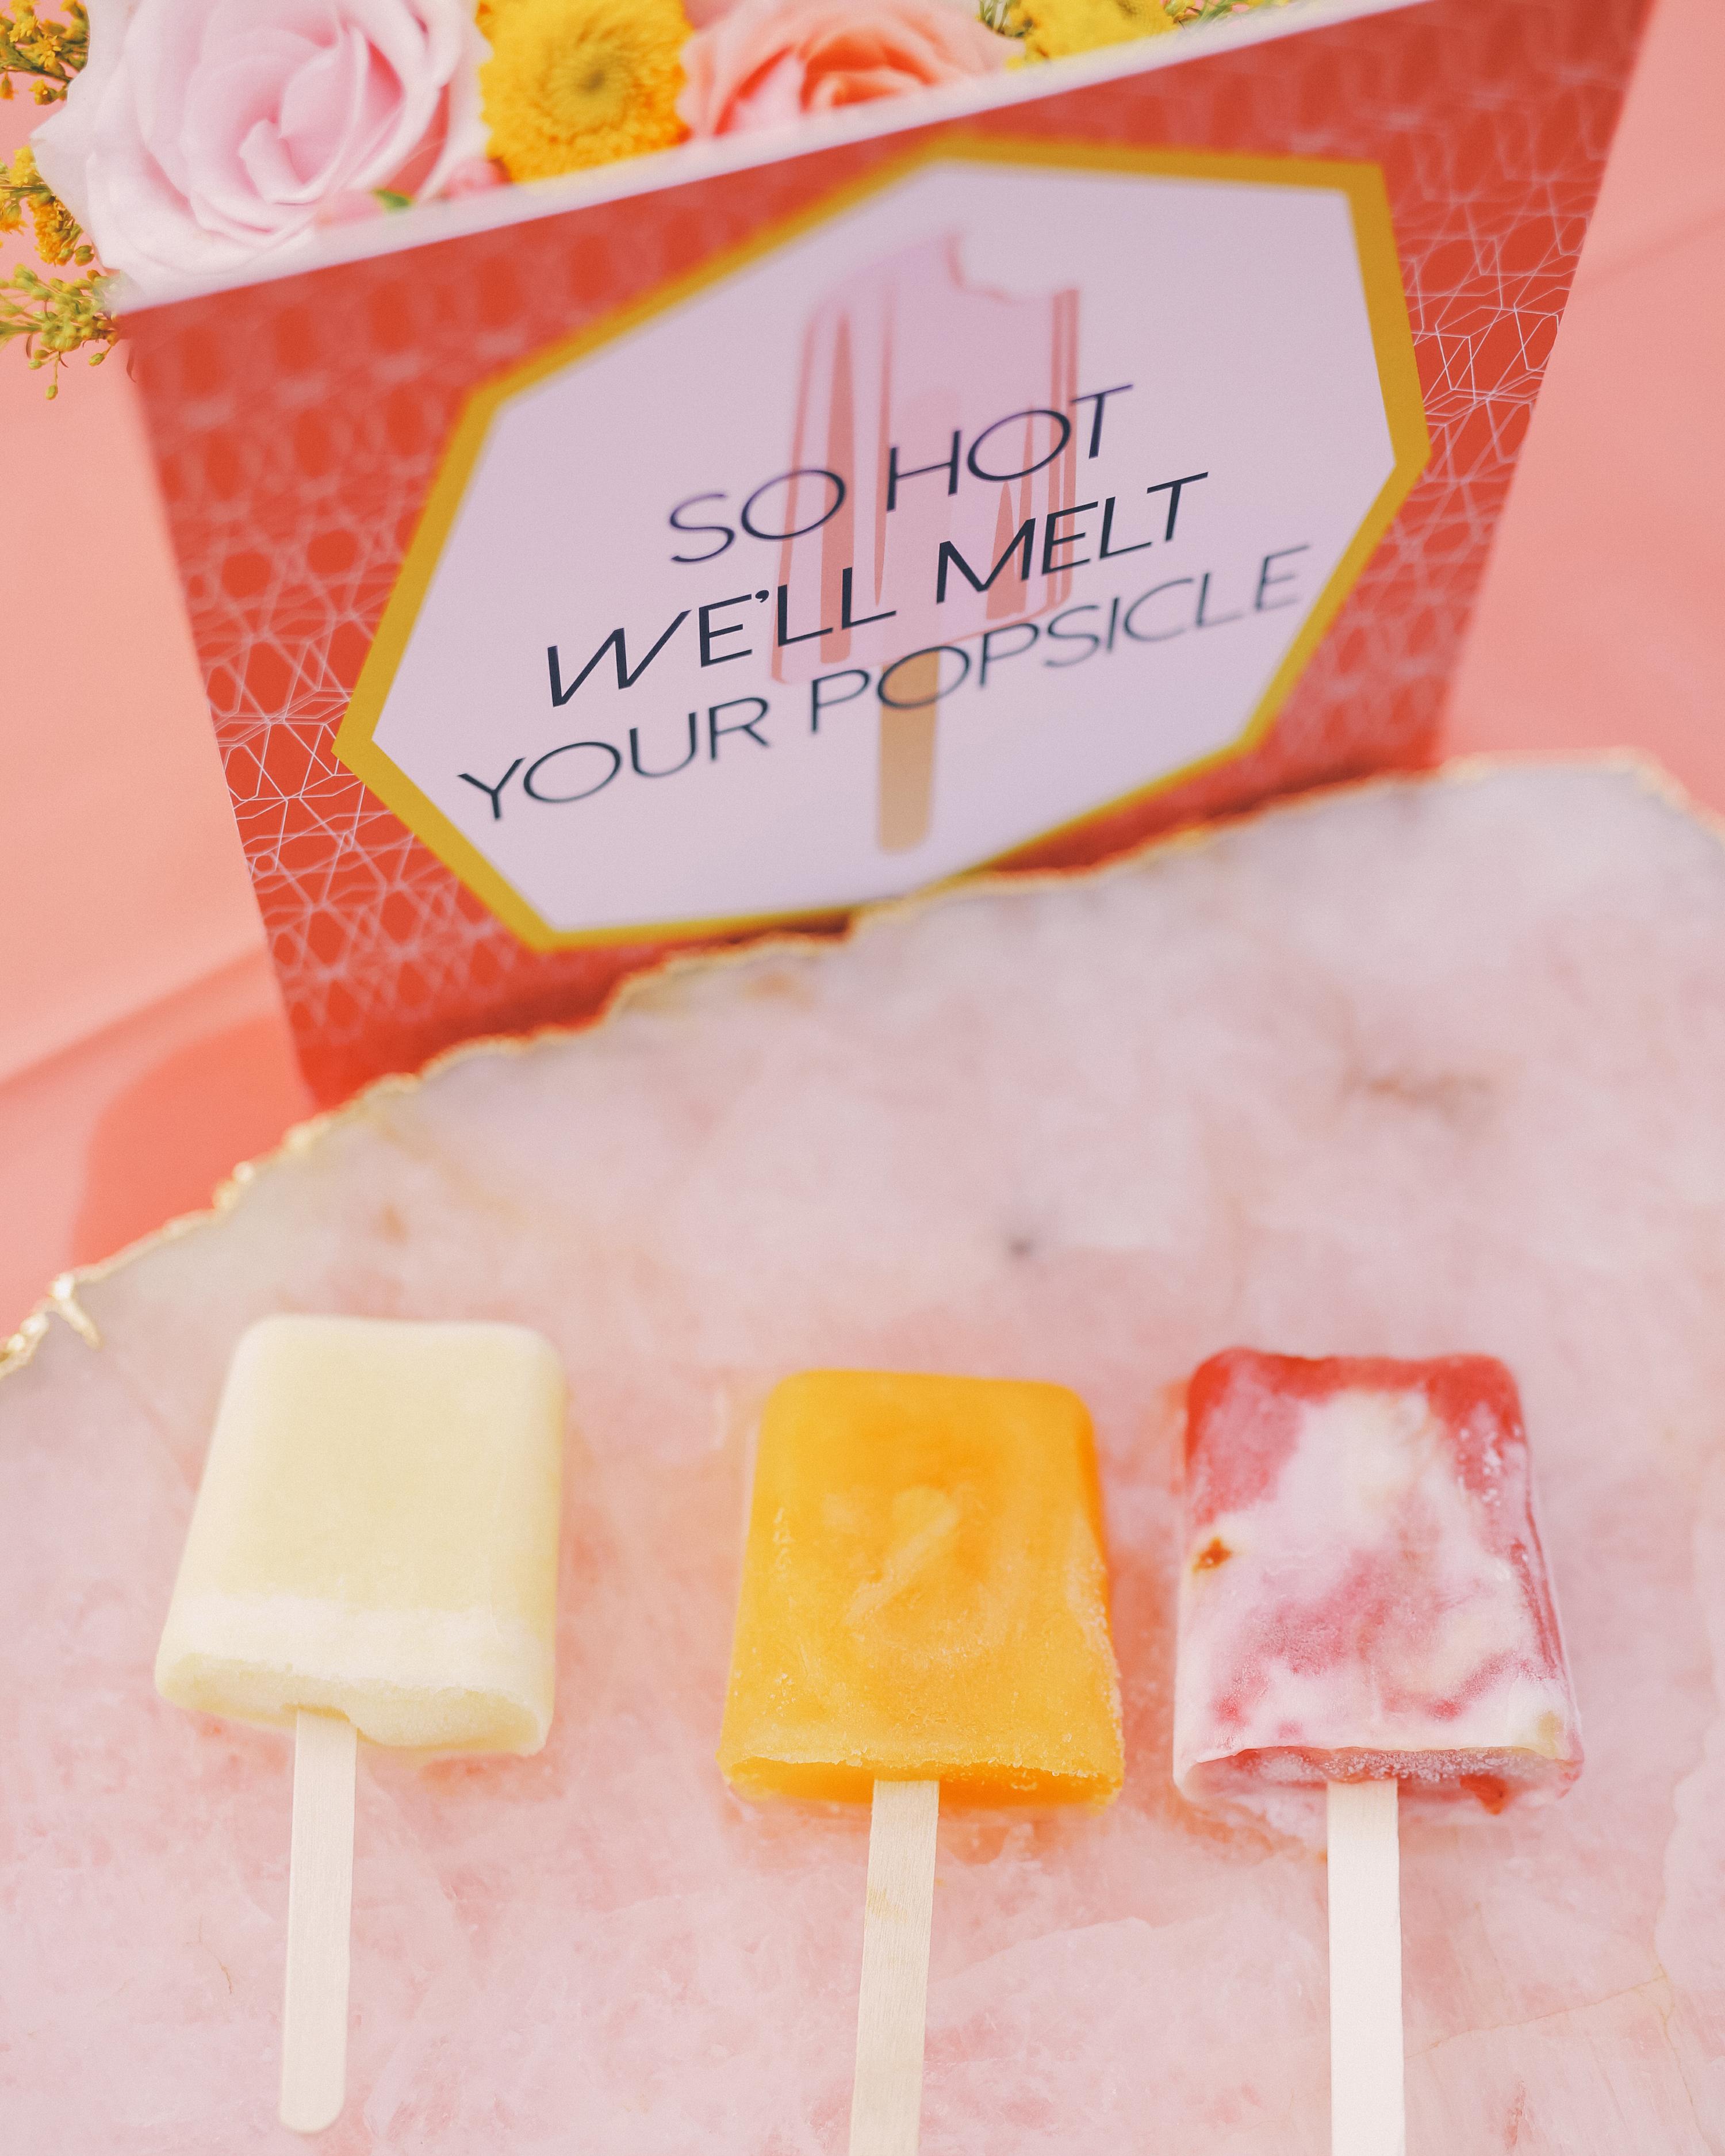 katie-brian-wedding-popsicles-3474-s111885-0515.jpg